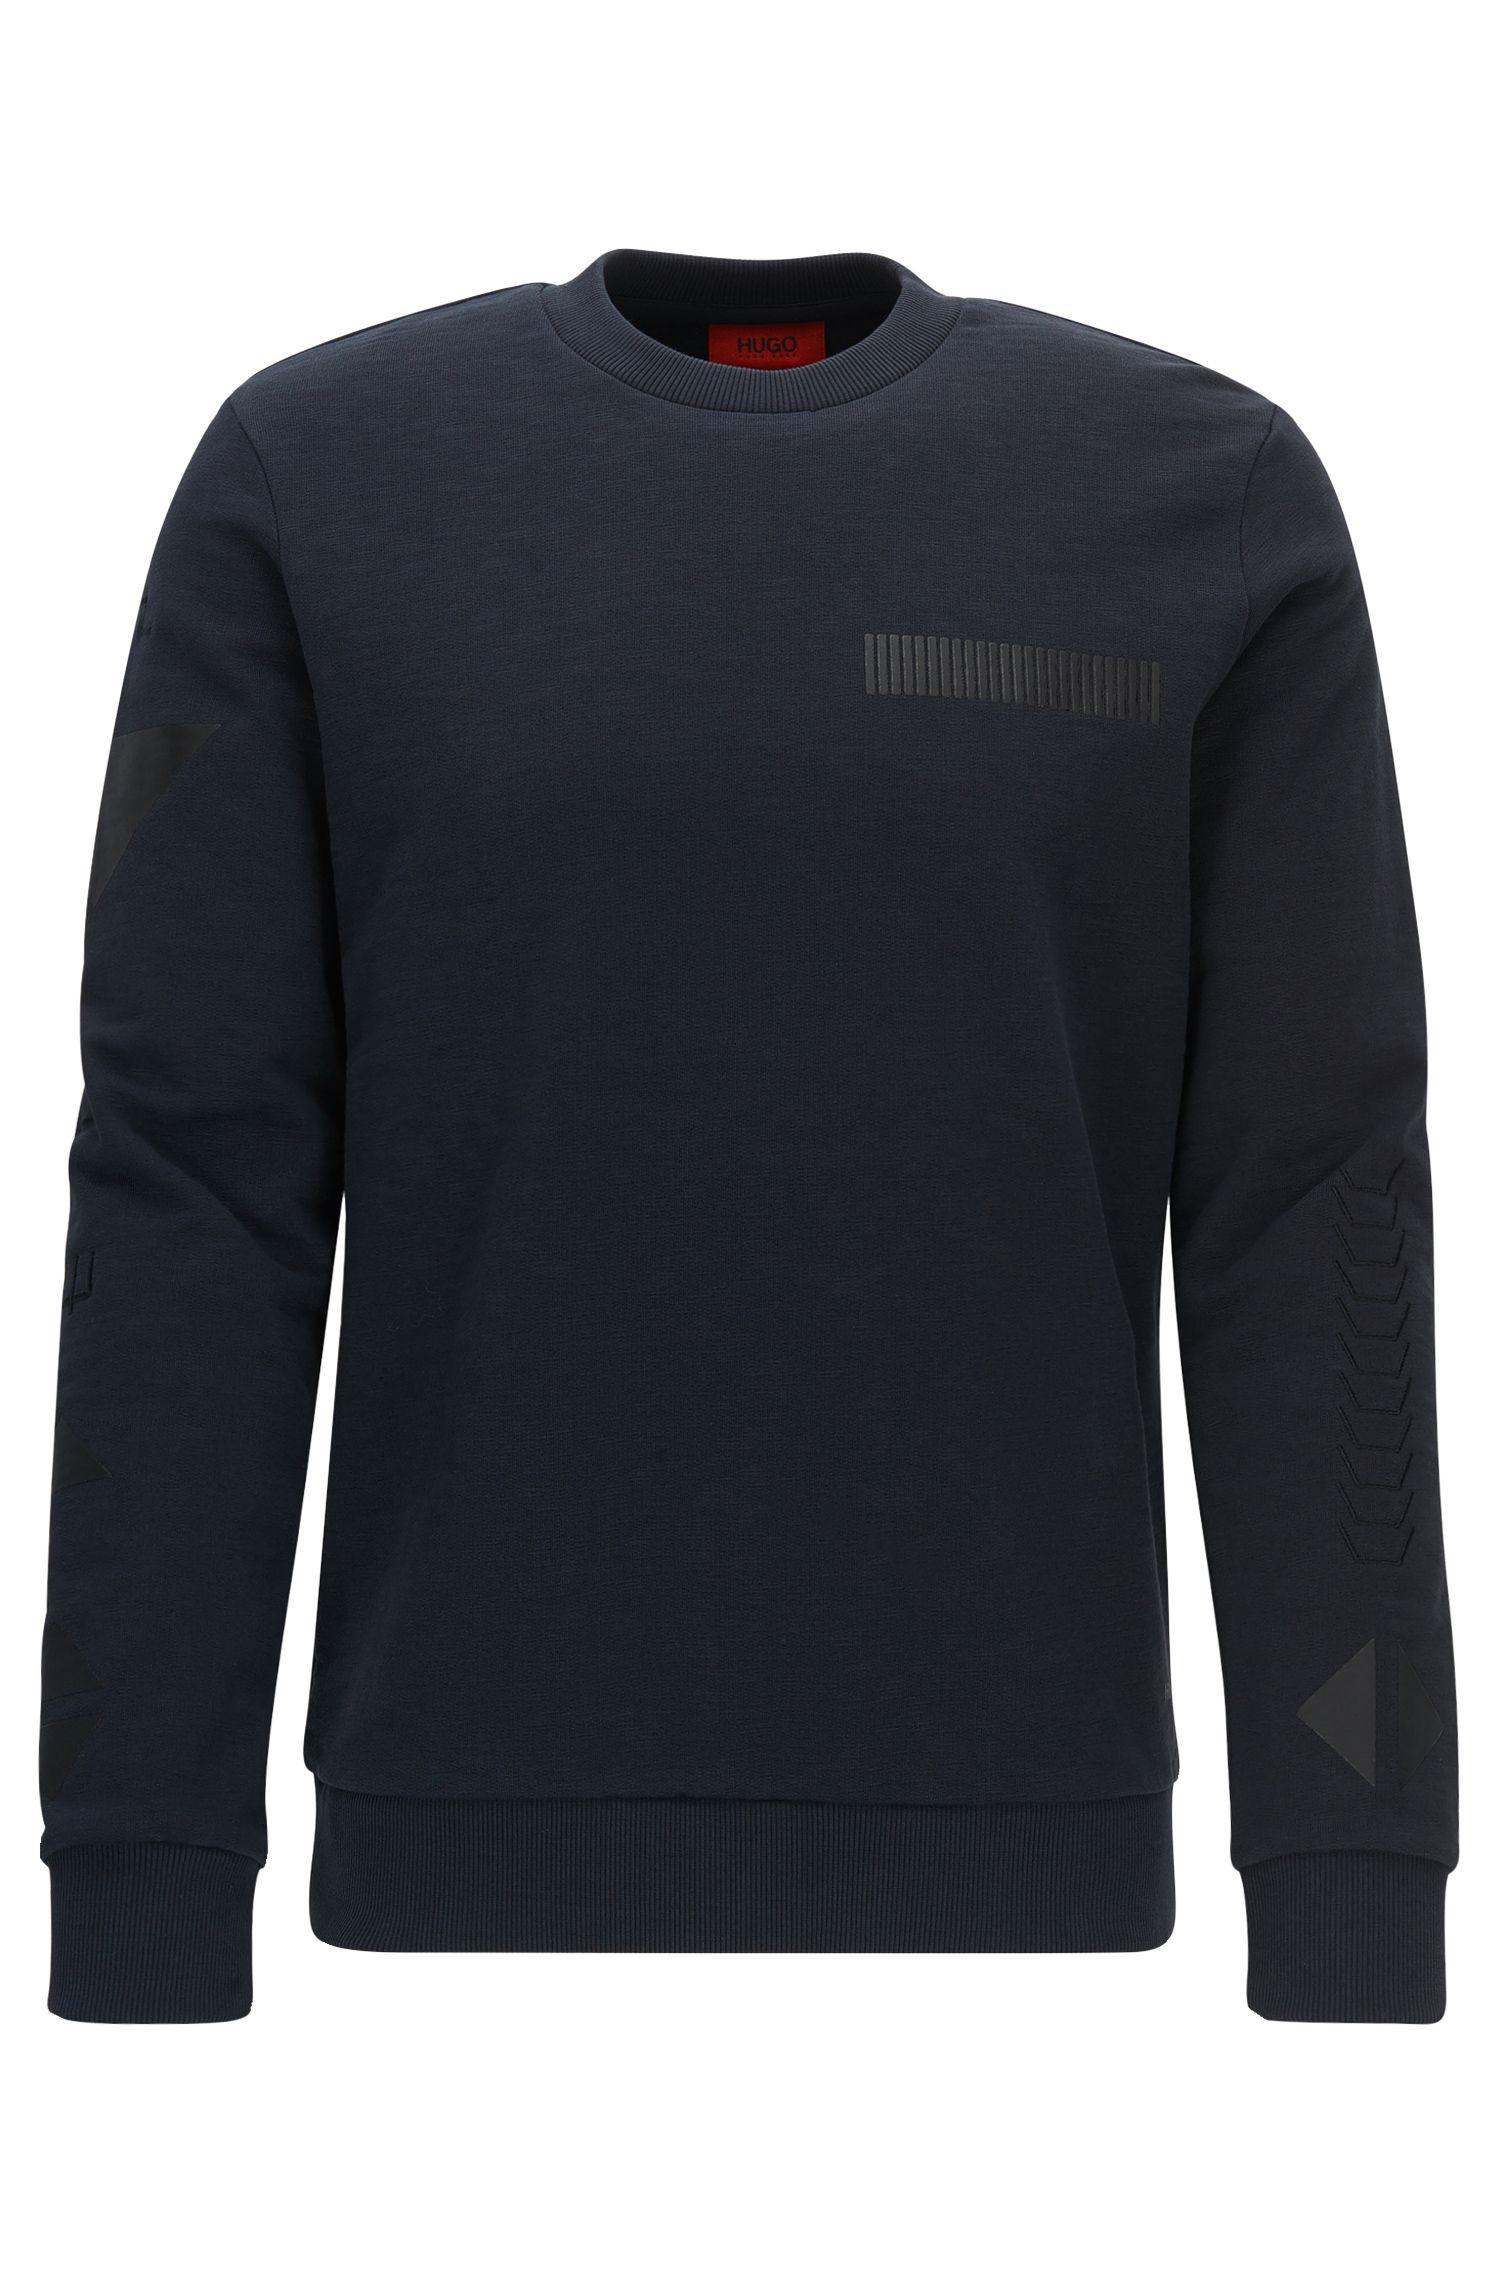 Printed Fleece Cotton Sweatershirt   Dopkins